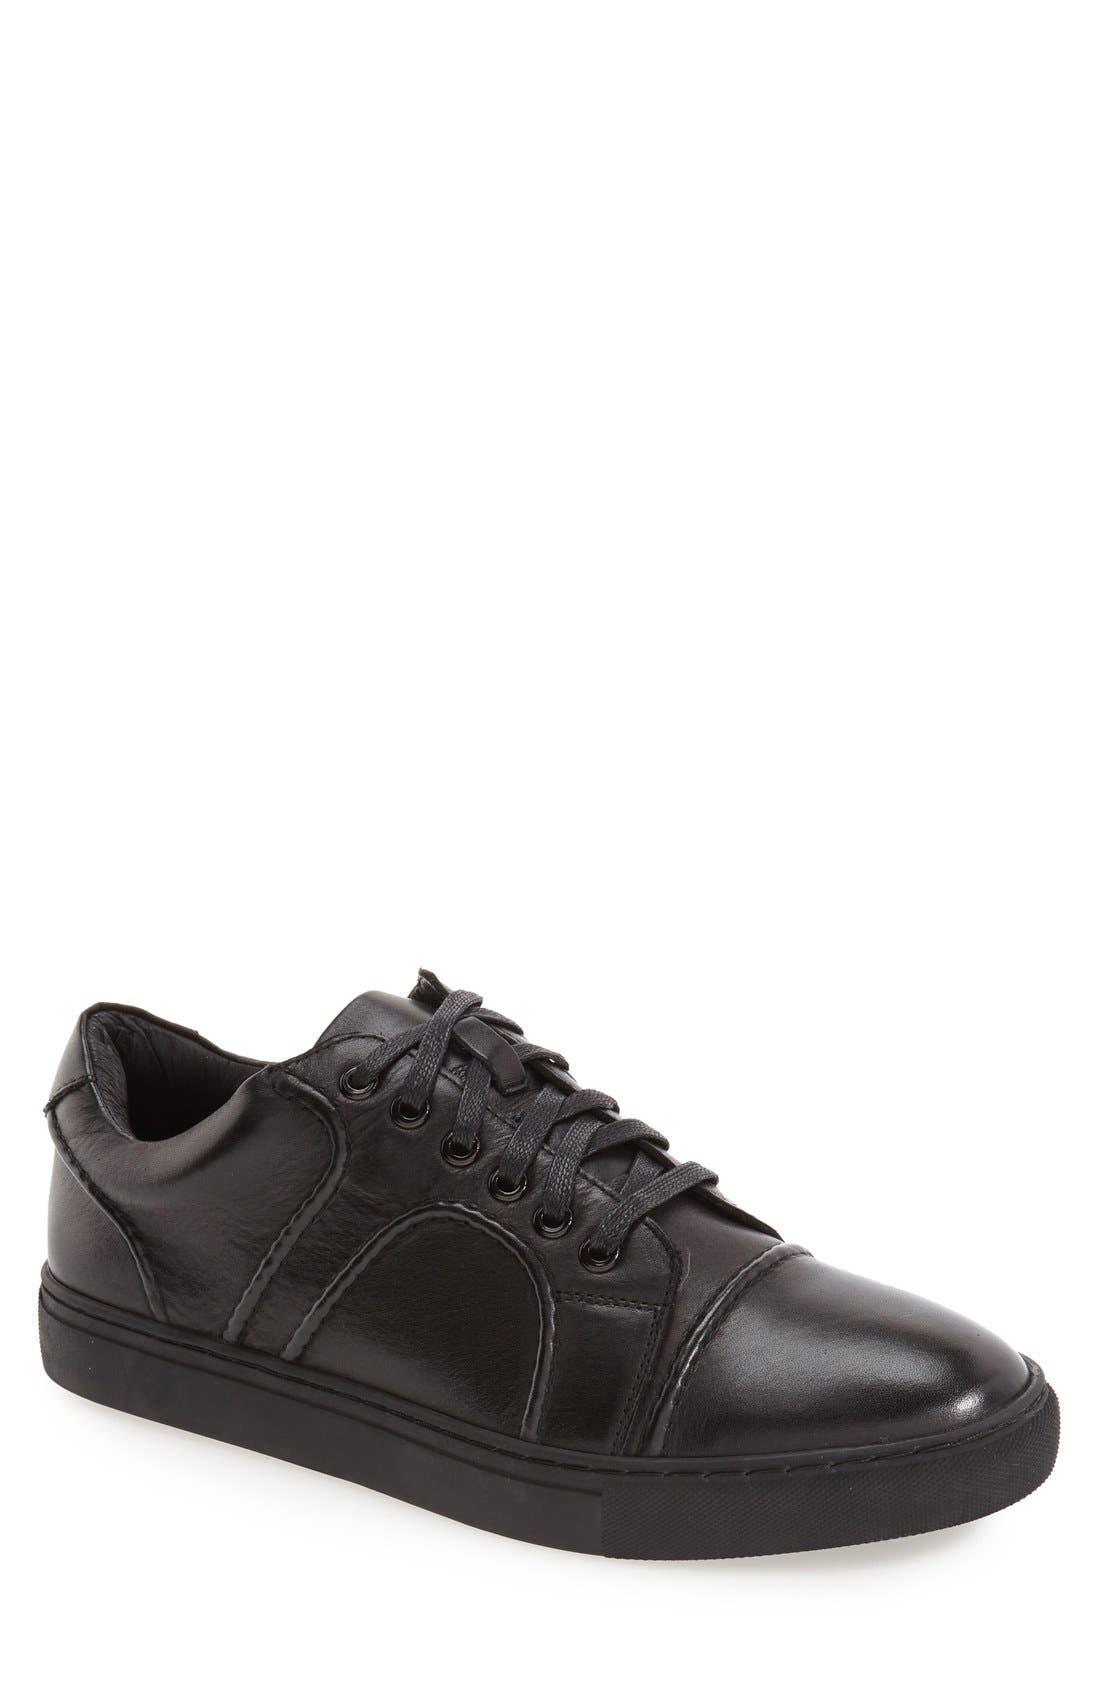 'Echo' Sneaker,                             Main thumbnail 1, color,                             Black